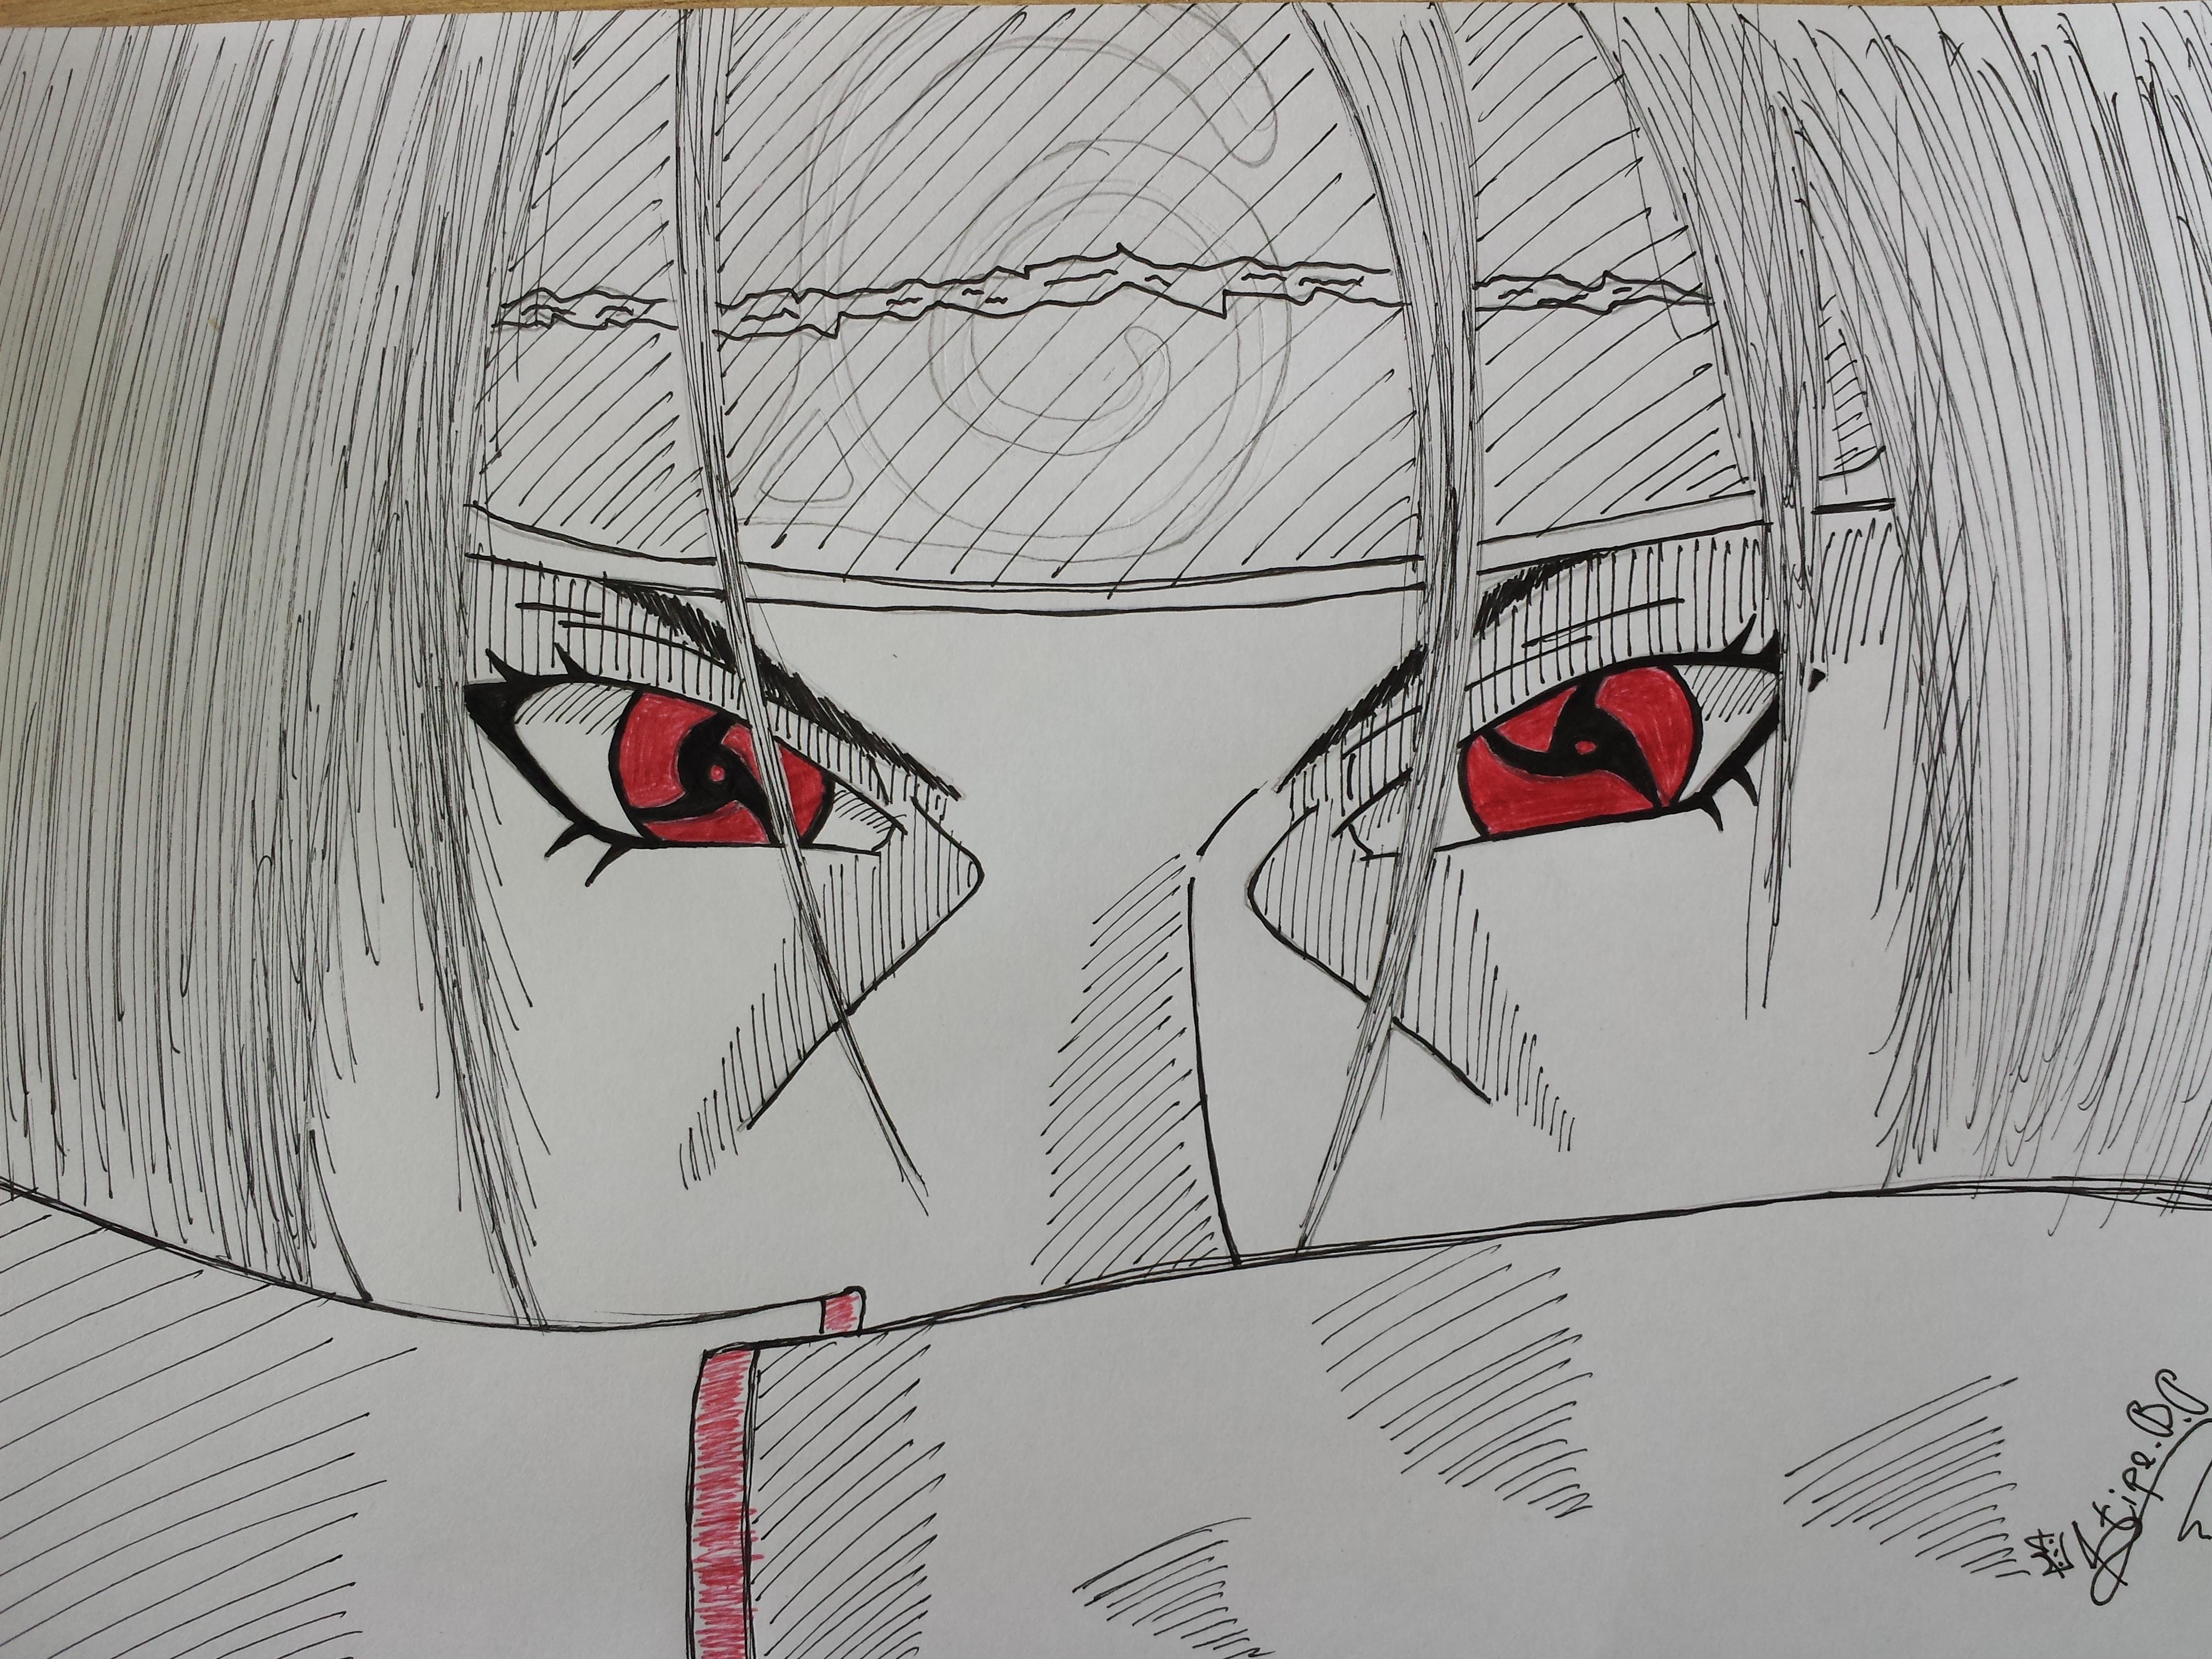 Uchiha Sasuke (Mangekyou Sharingan) by CriviumARTGAME on ... |Itachi Mangekyou Sharingan Drawing